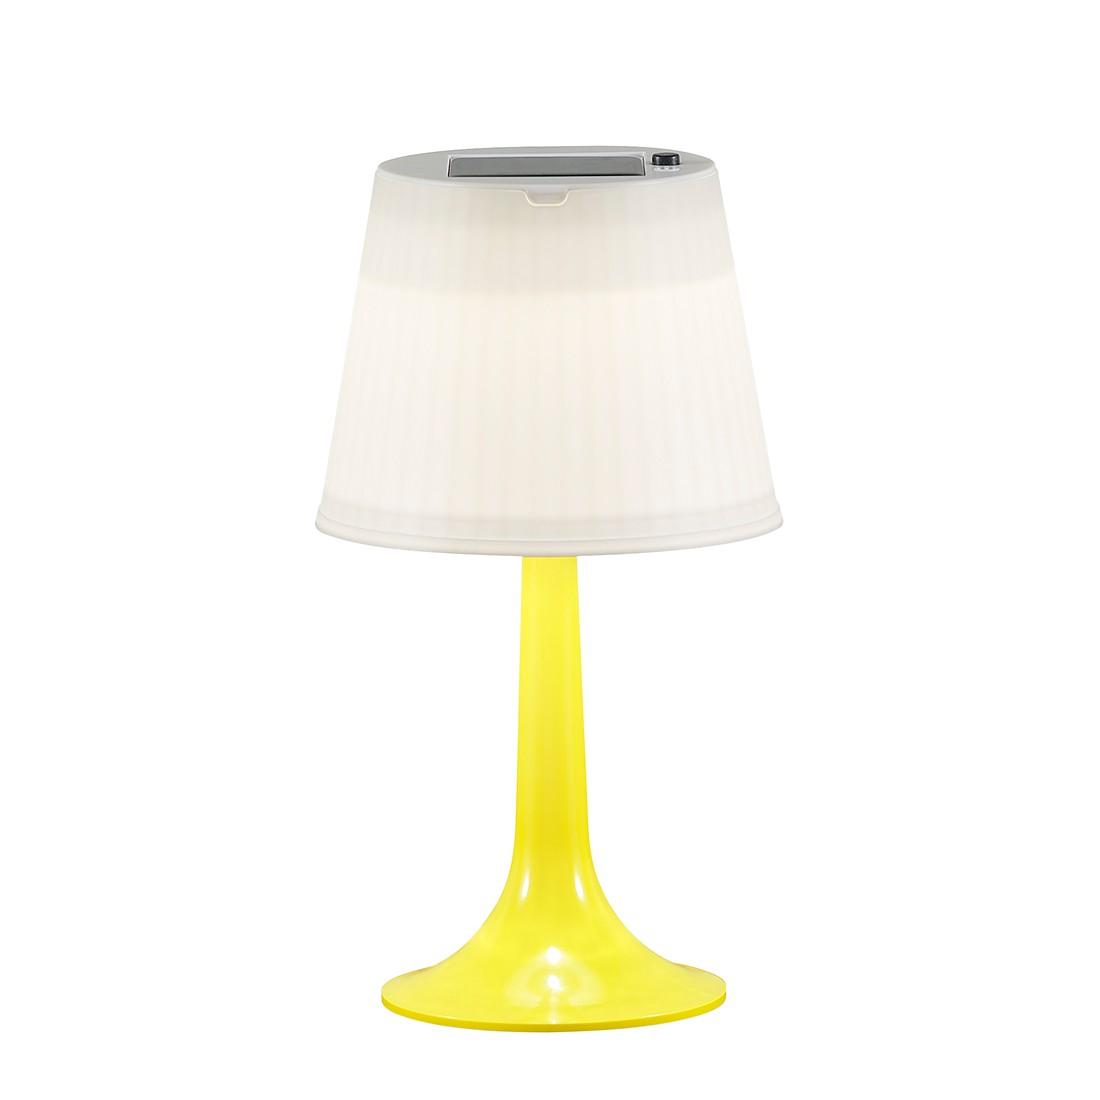 LED-Außenleuchte Assisi Sitra ● Kunststoff ● 1-flammig ● Weiß / Gelb- Konstsmide A+